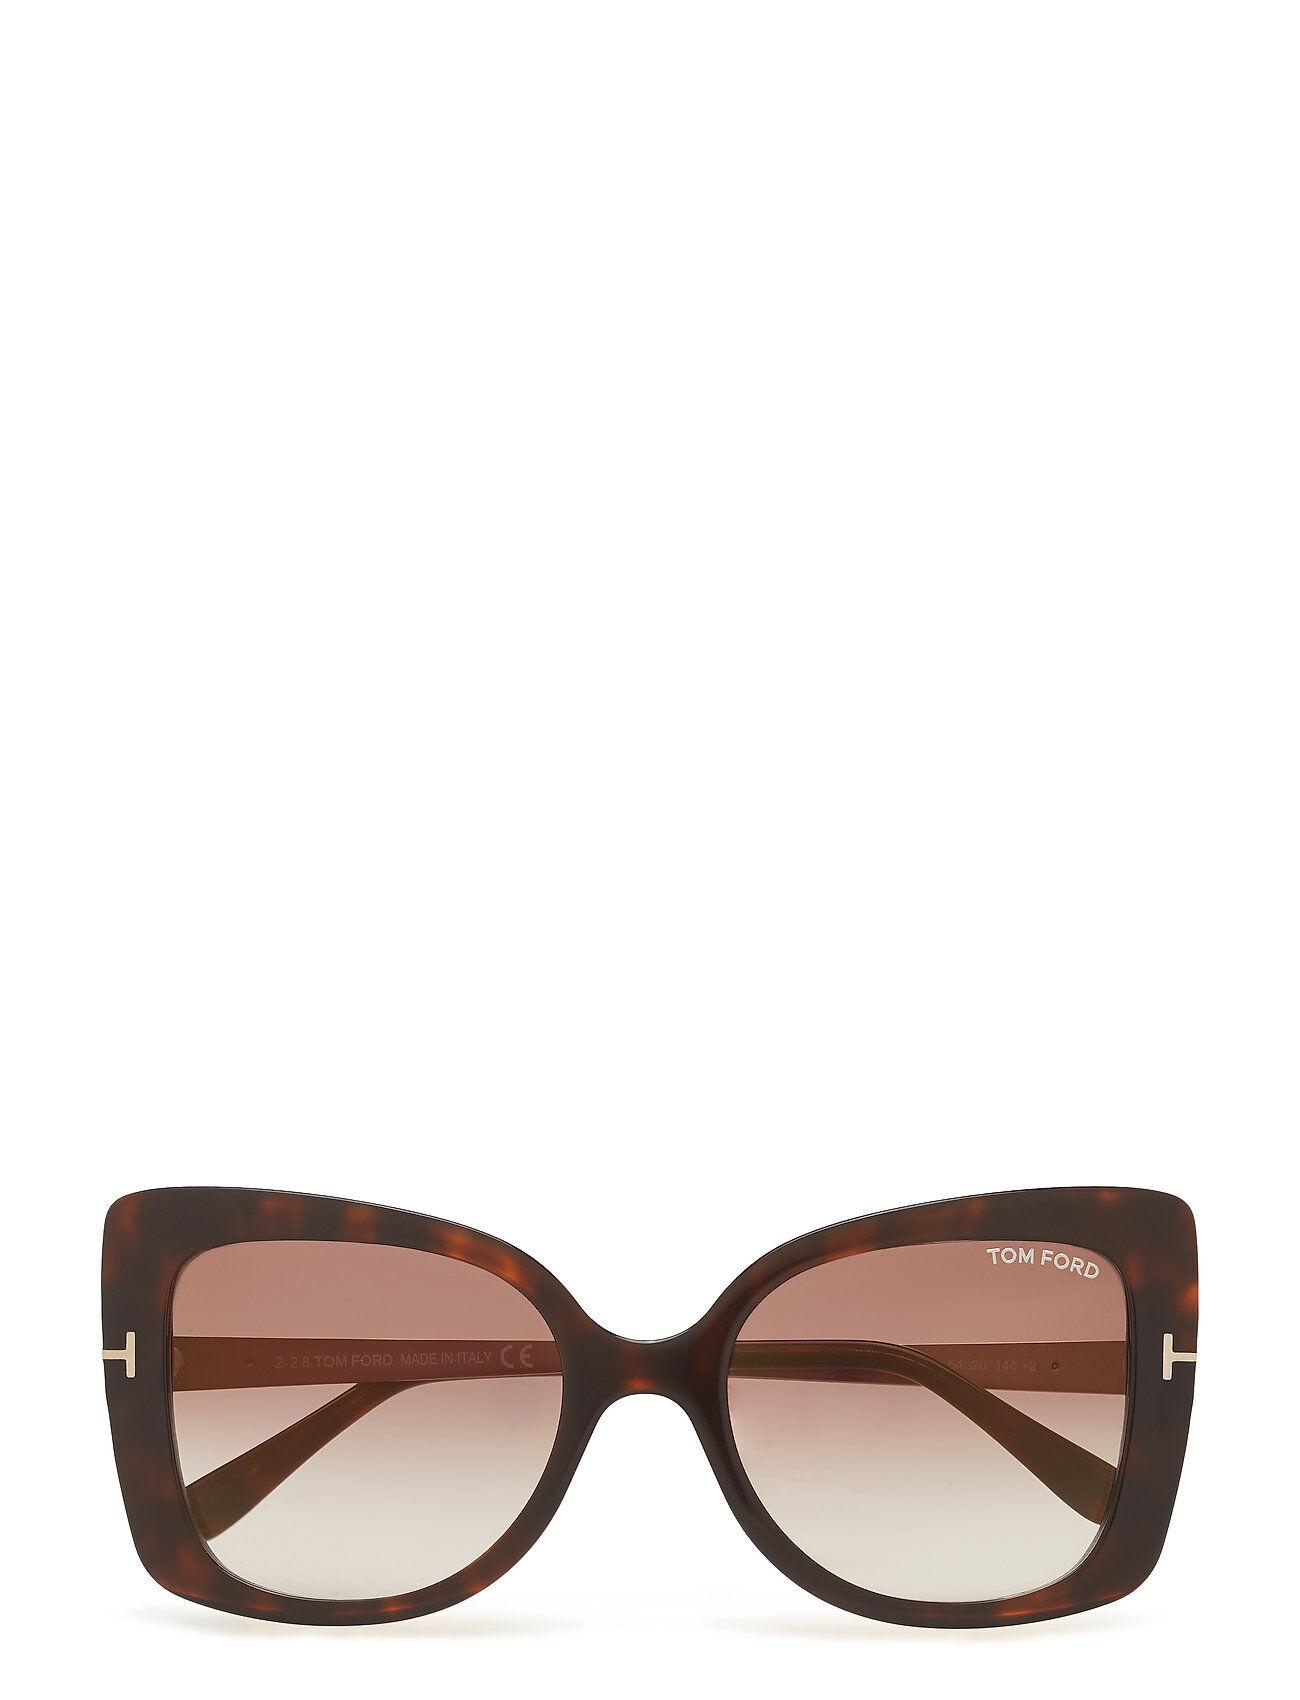 Tom Ford Sunglasses Tom Ford Gianna-02